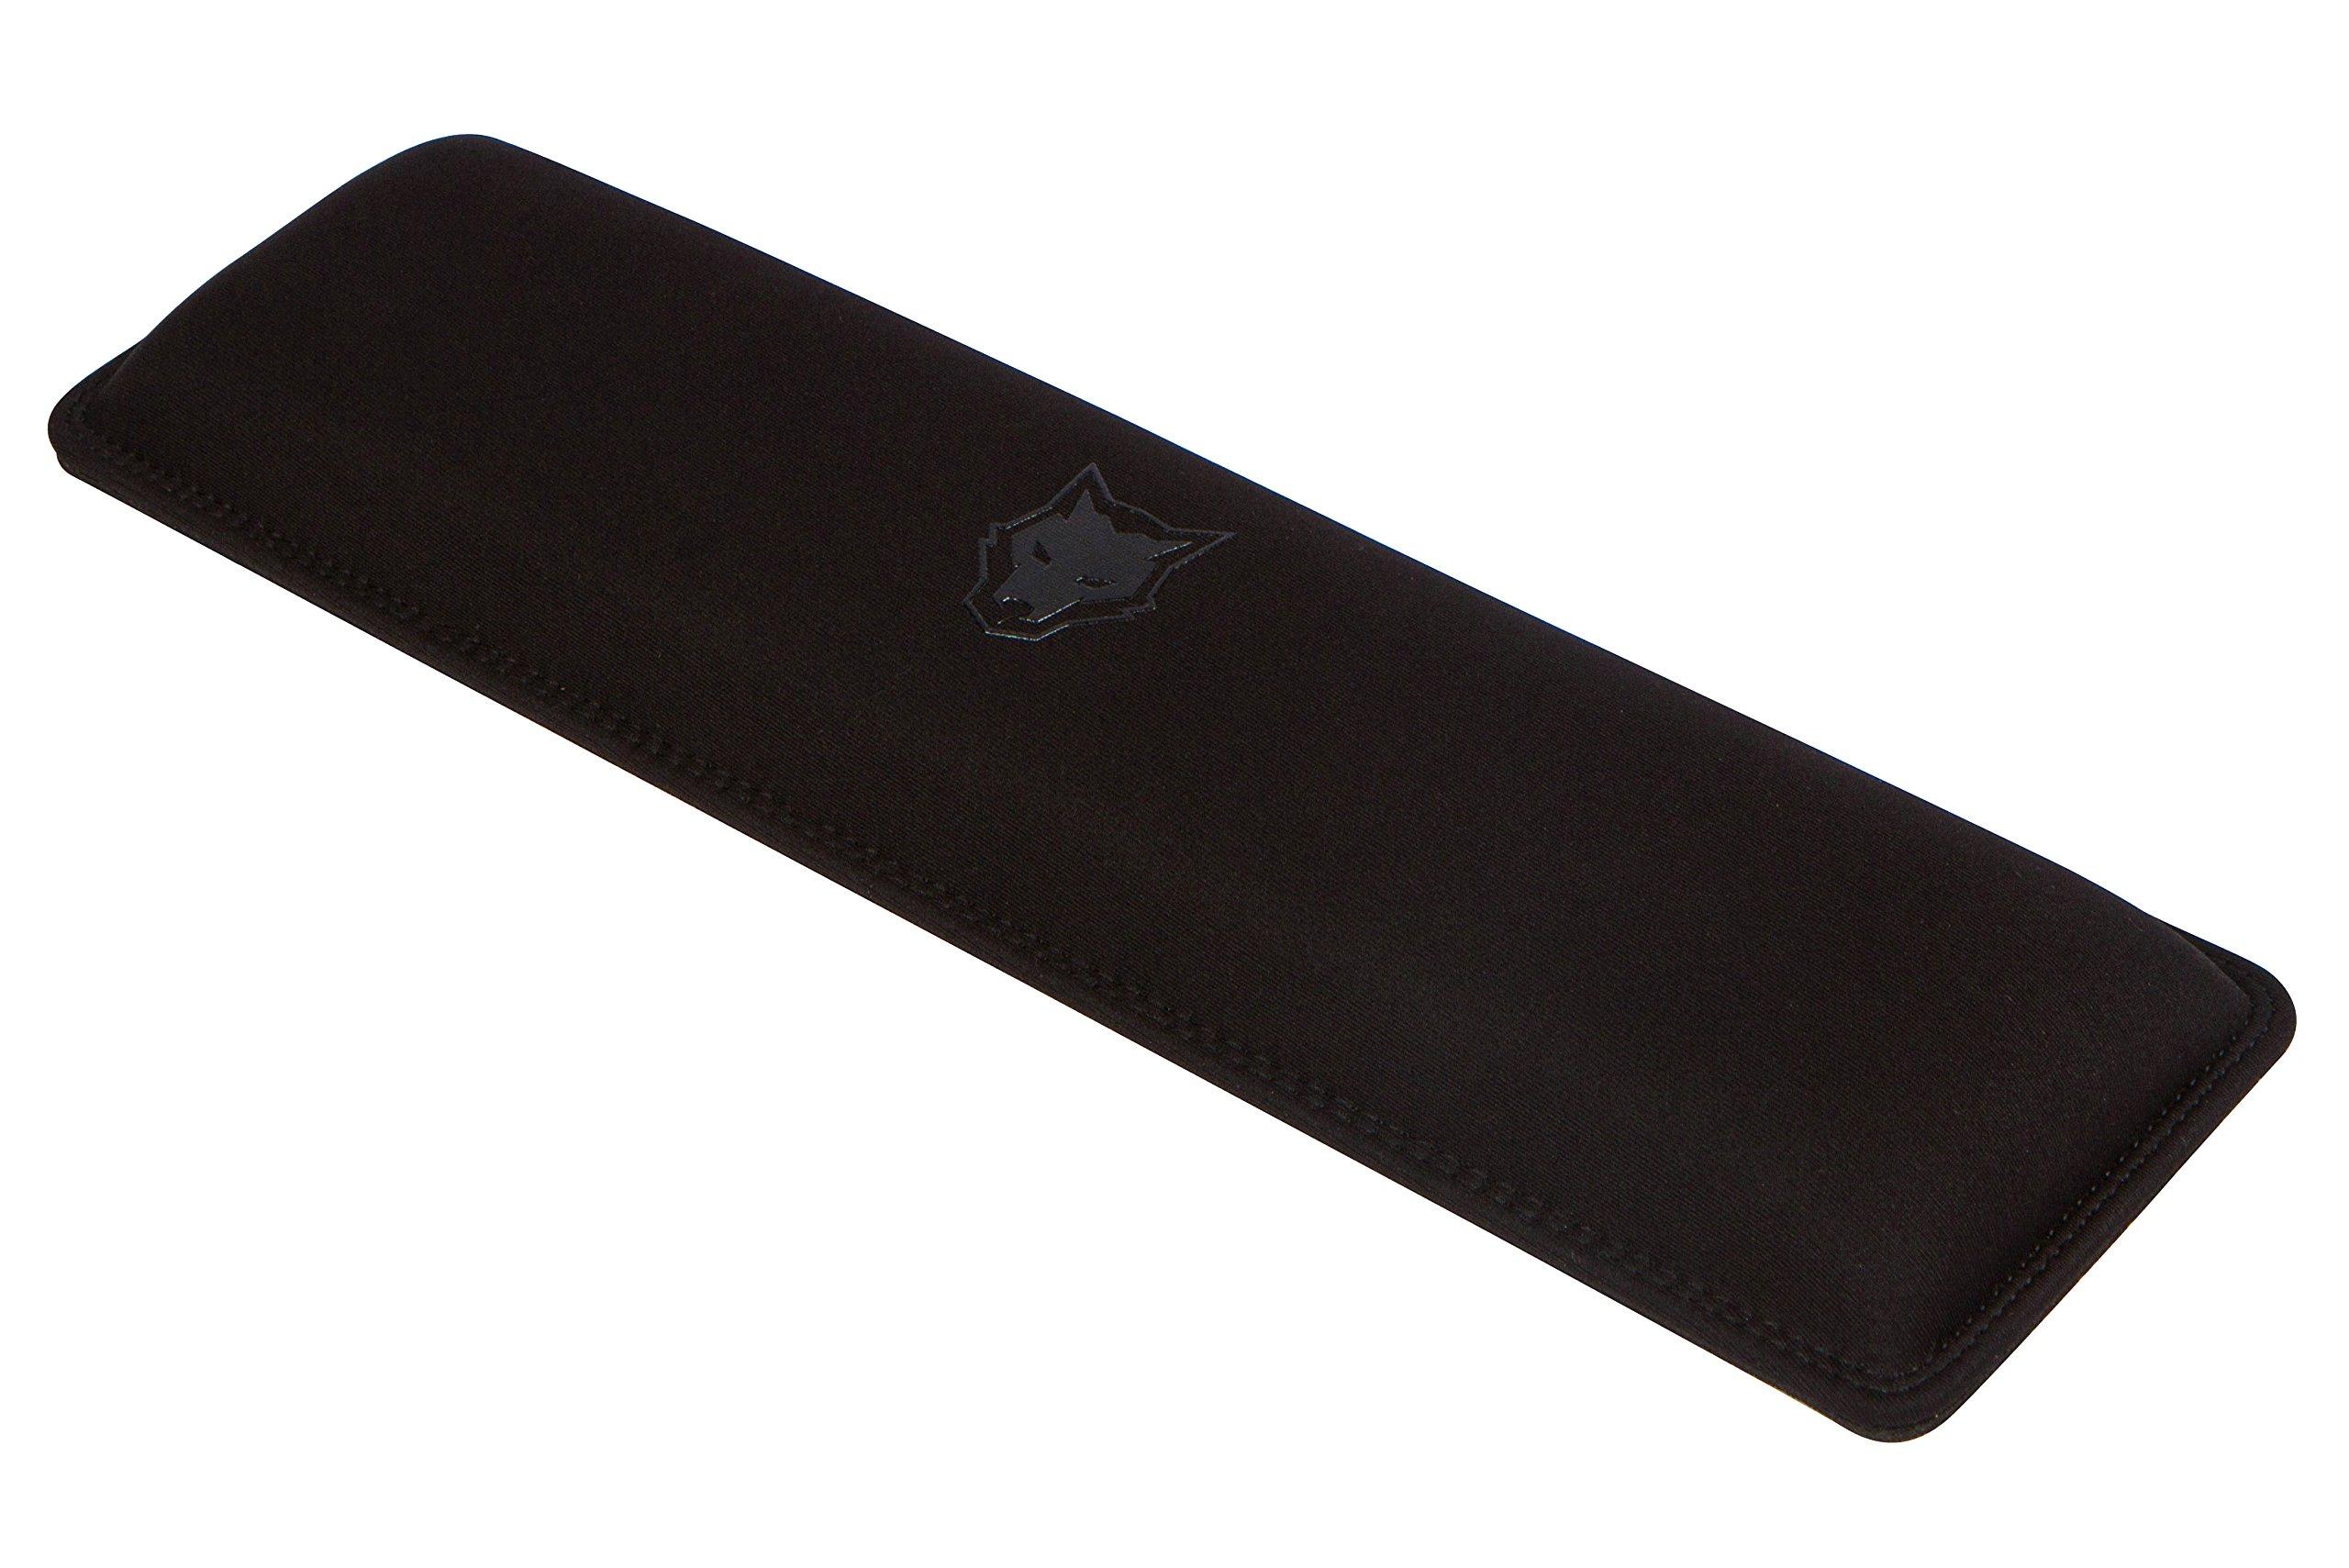 SubZERO Gaming Wrist Rest/Pad for Keyboards, TENKEYLESS, Stitched Edges, 14.5''x4''x1'' (Black) by SubZERO Gaming